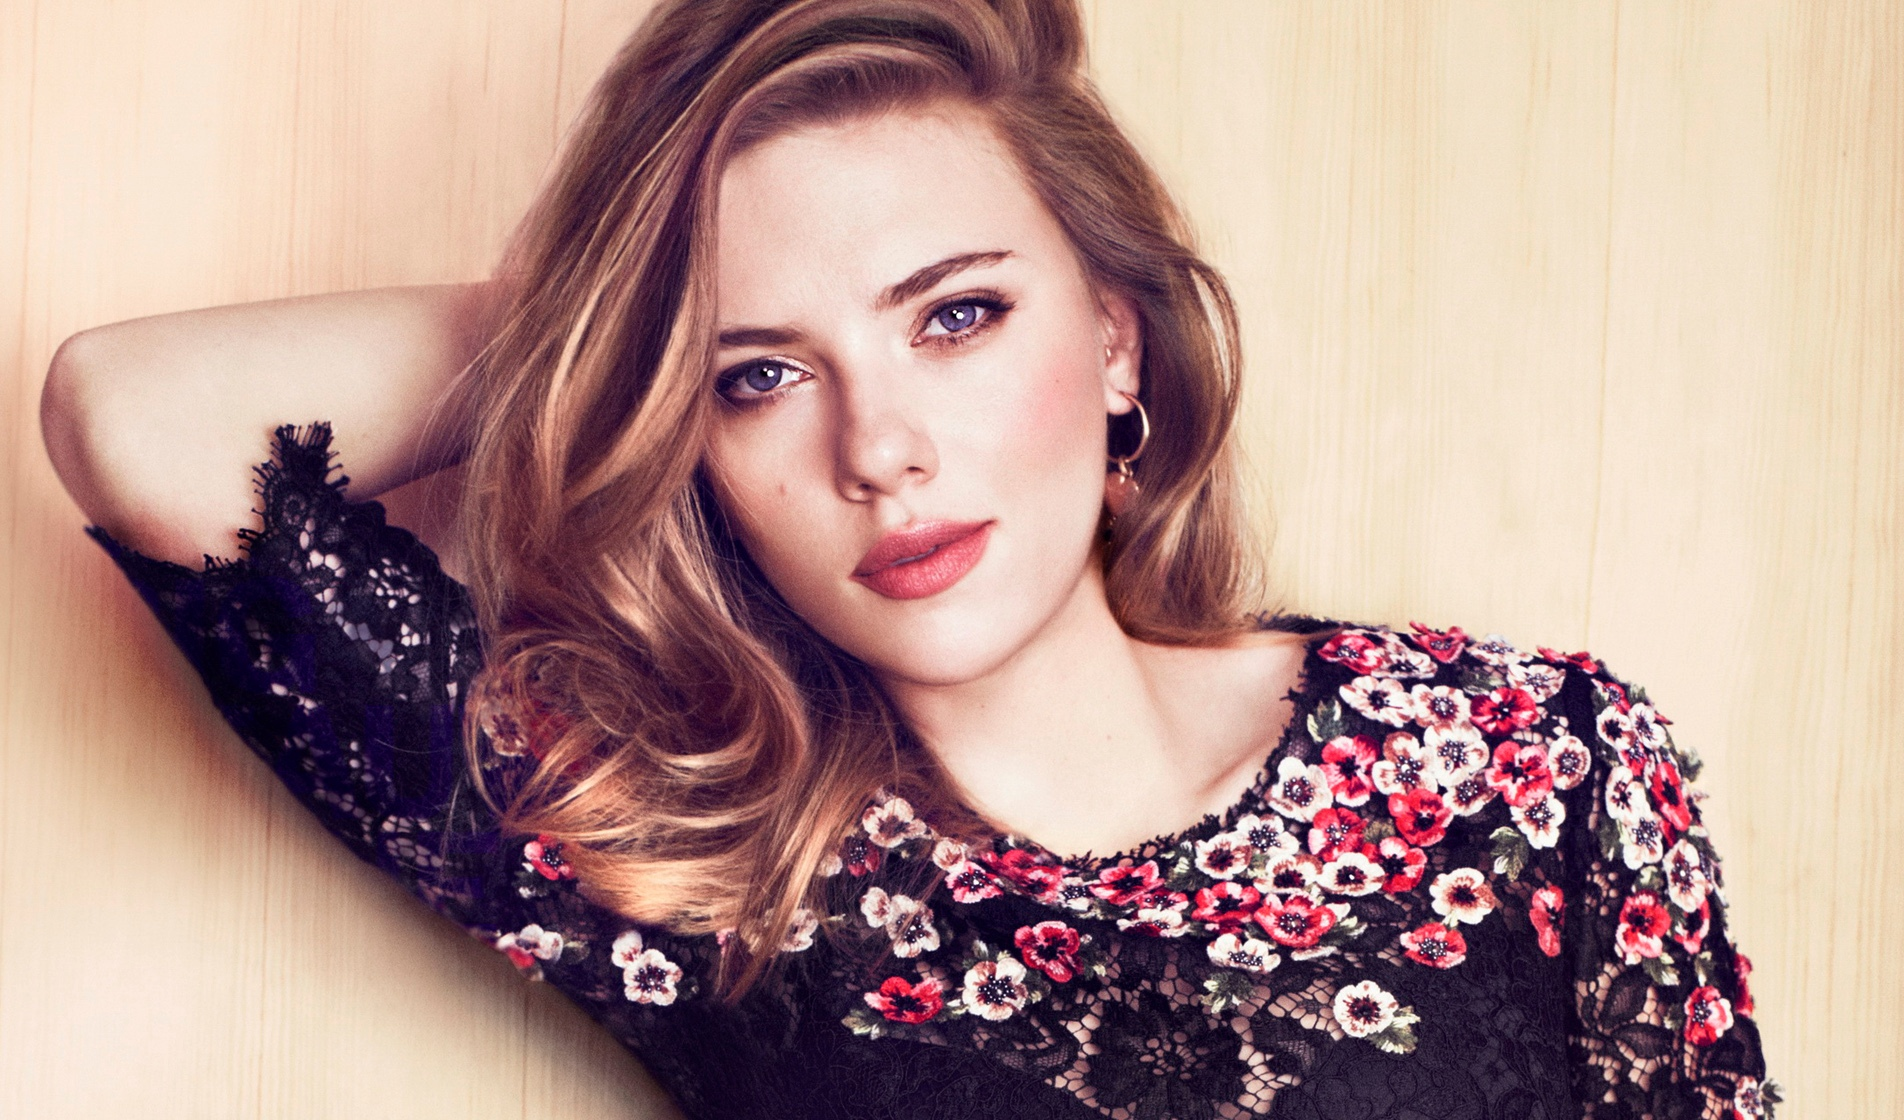 wanita tercantik 2014